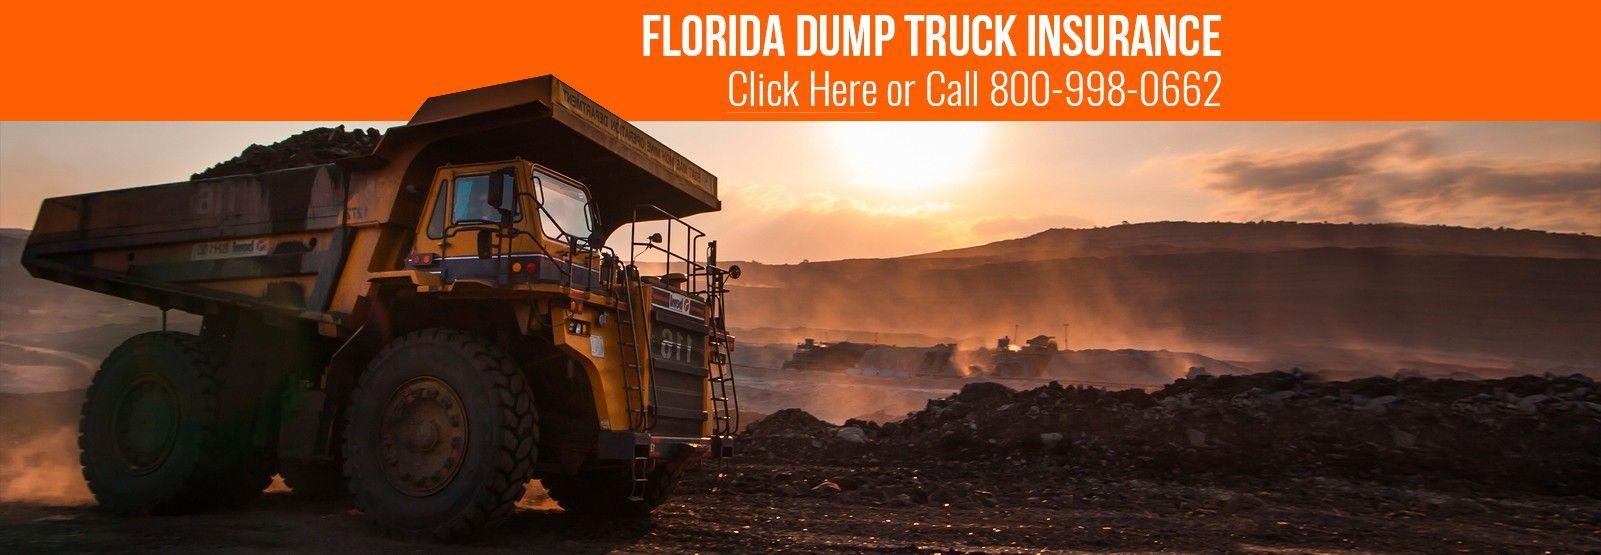 Florida truck insurance tow truck insurance florida